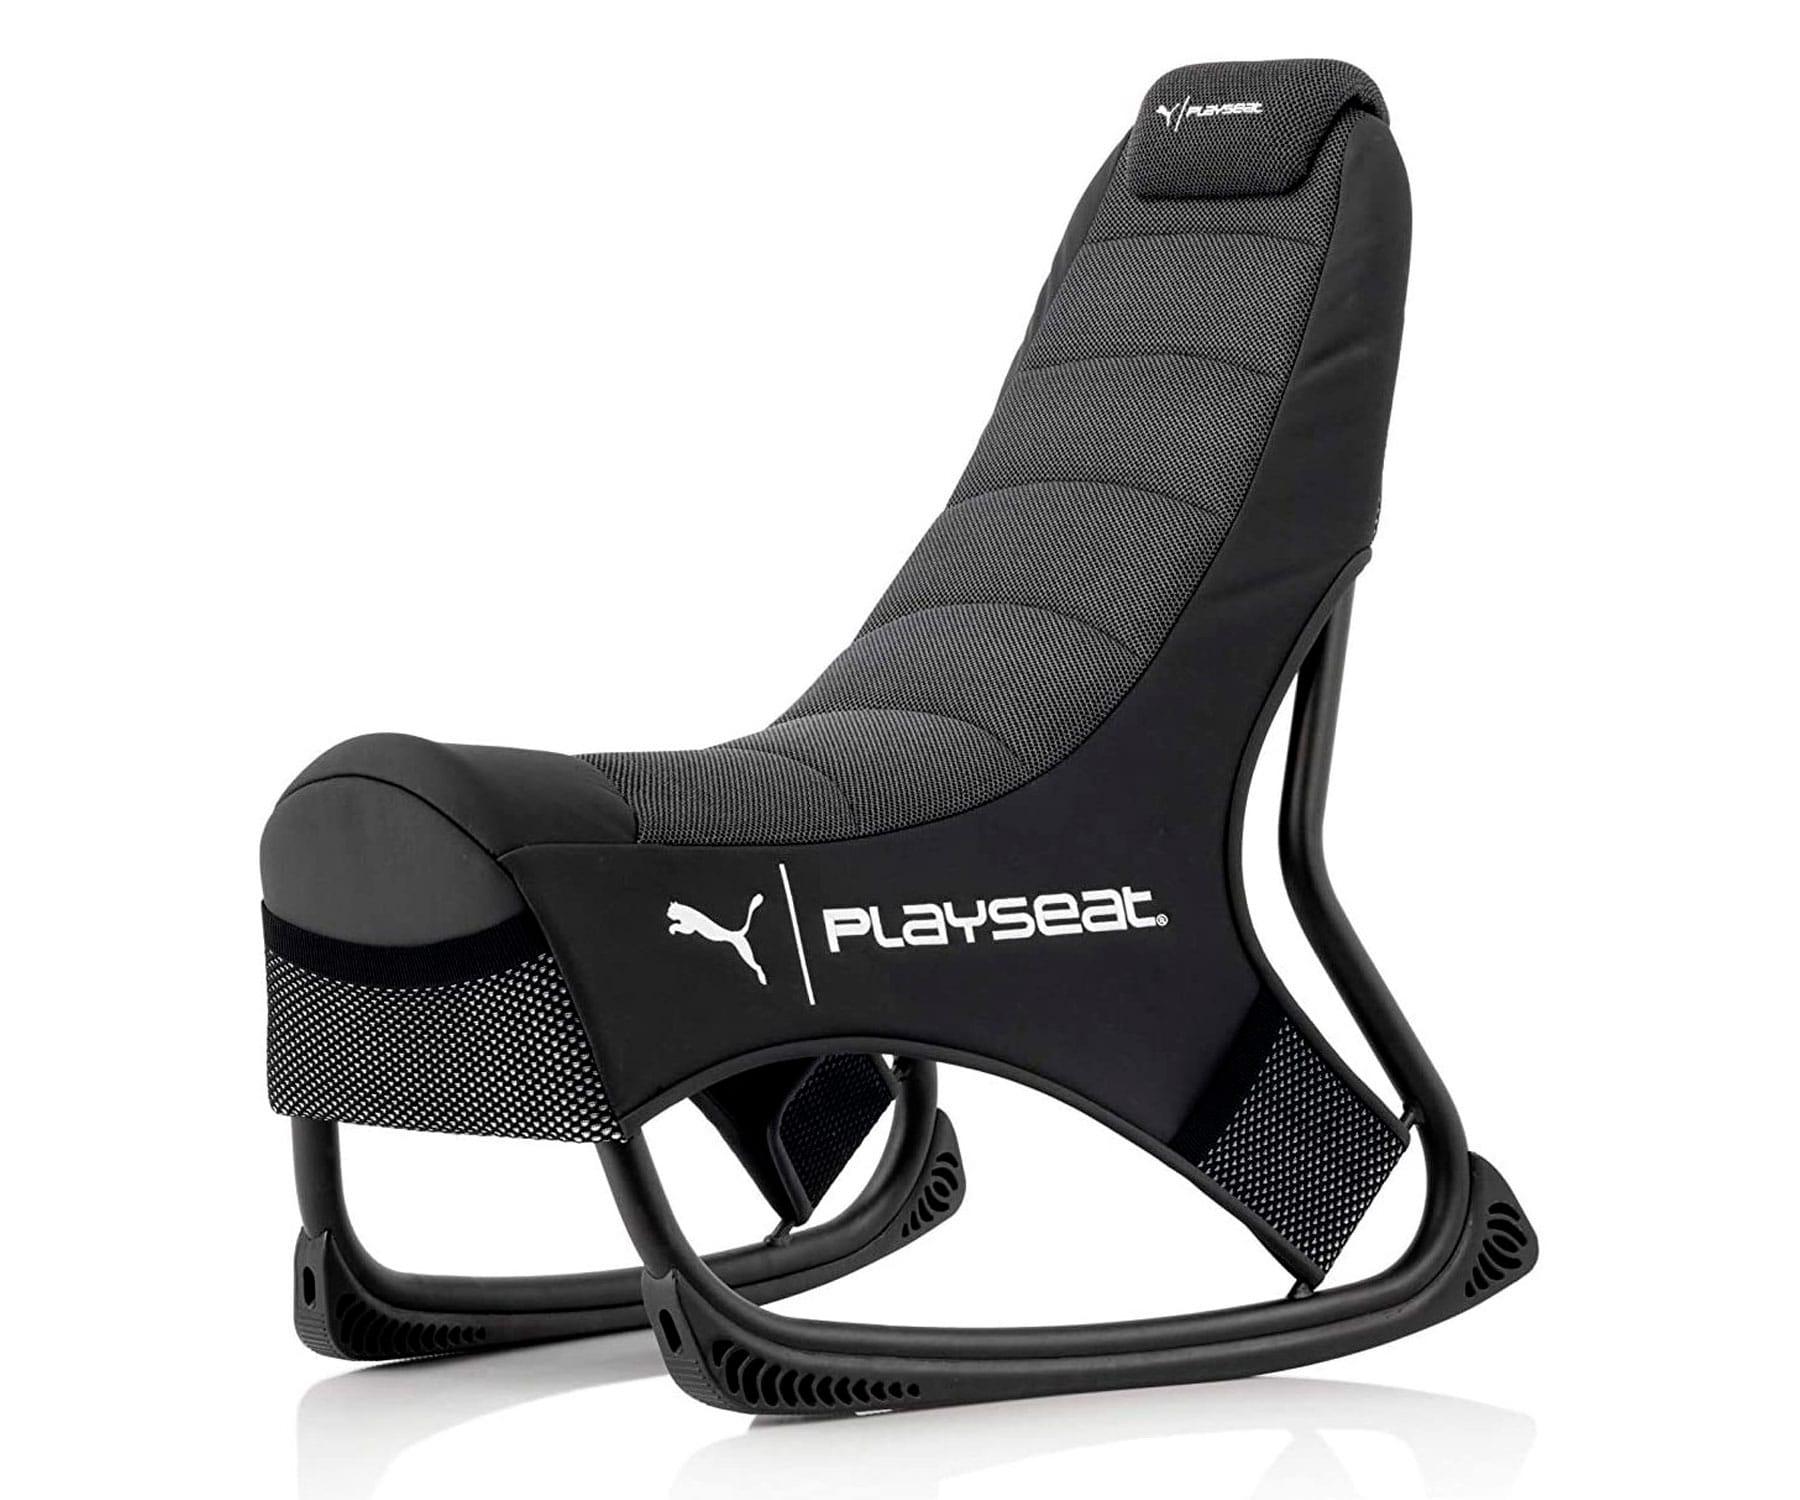 PLAYSEAT PUMA GAME SEAT  SILLA GAMING NEGRA/LIBERTAD DE MOVIMIENTO